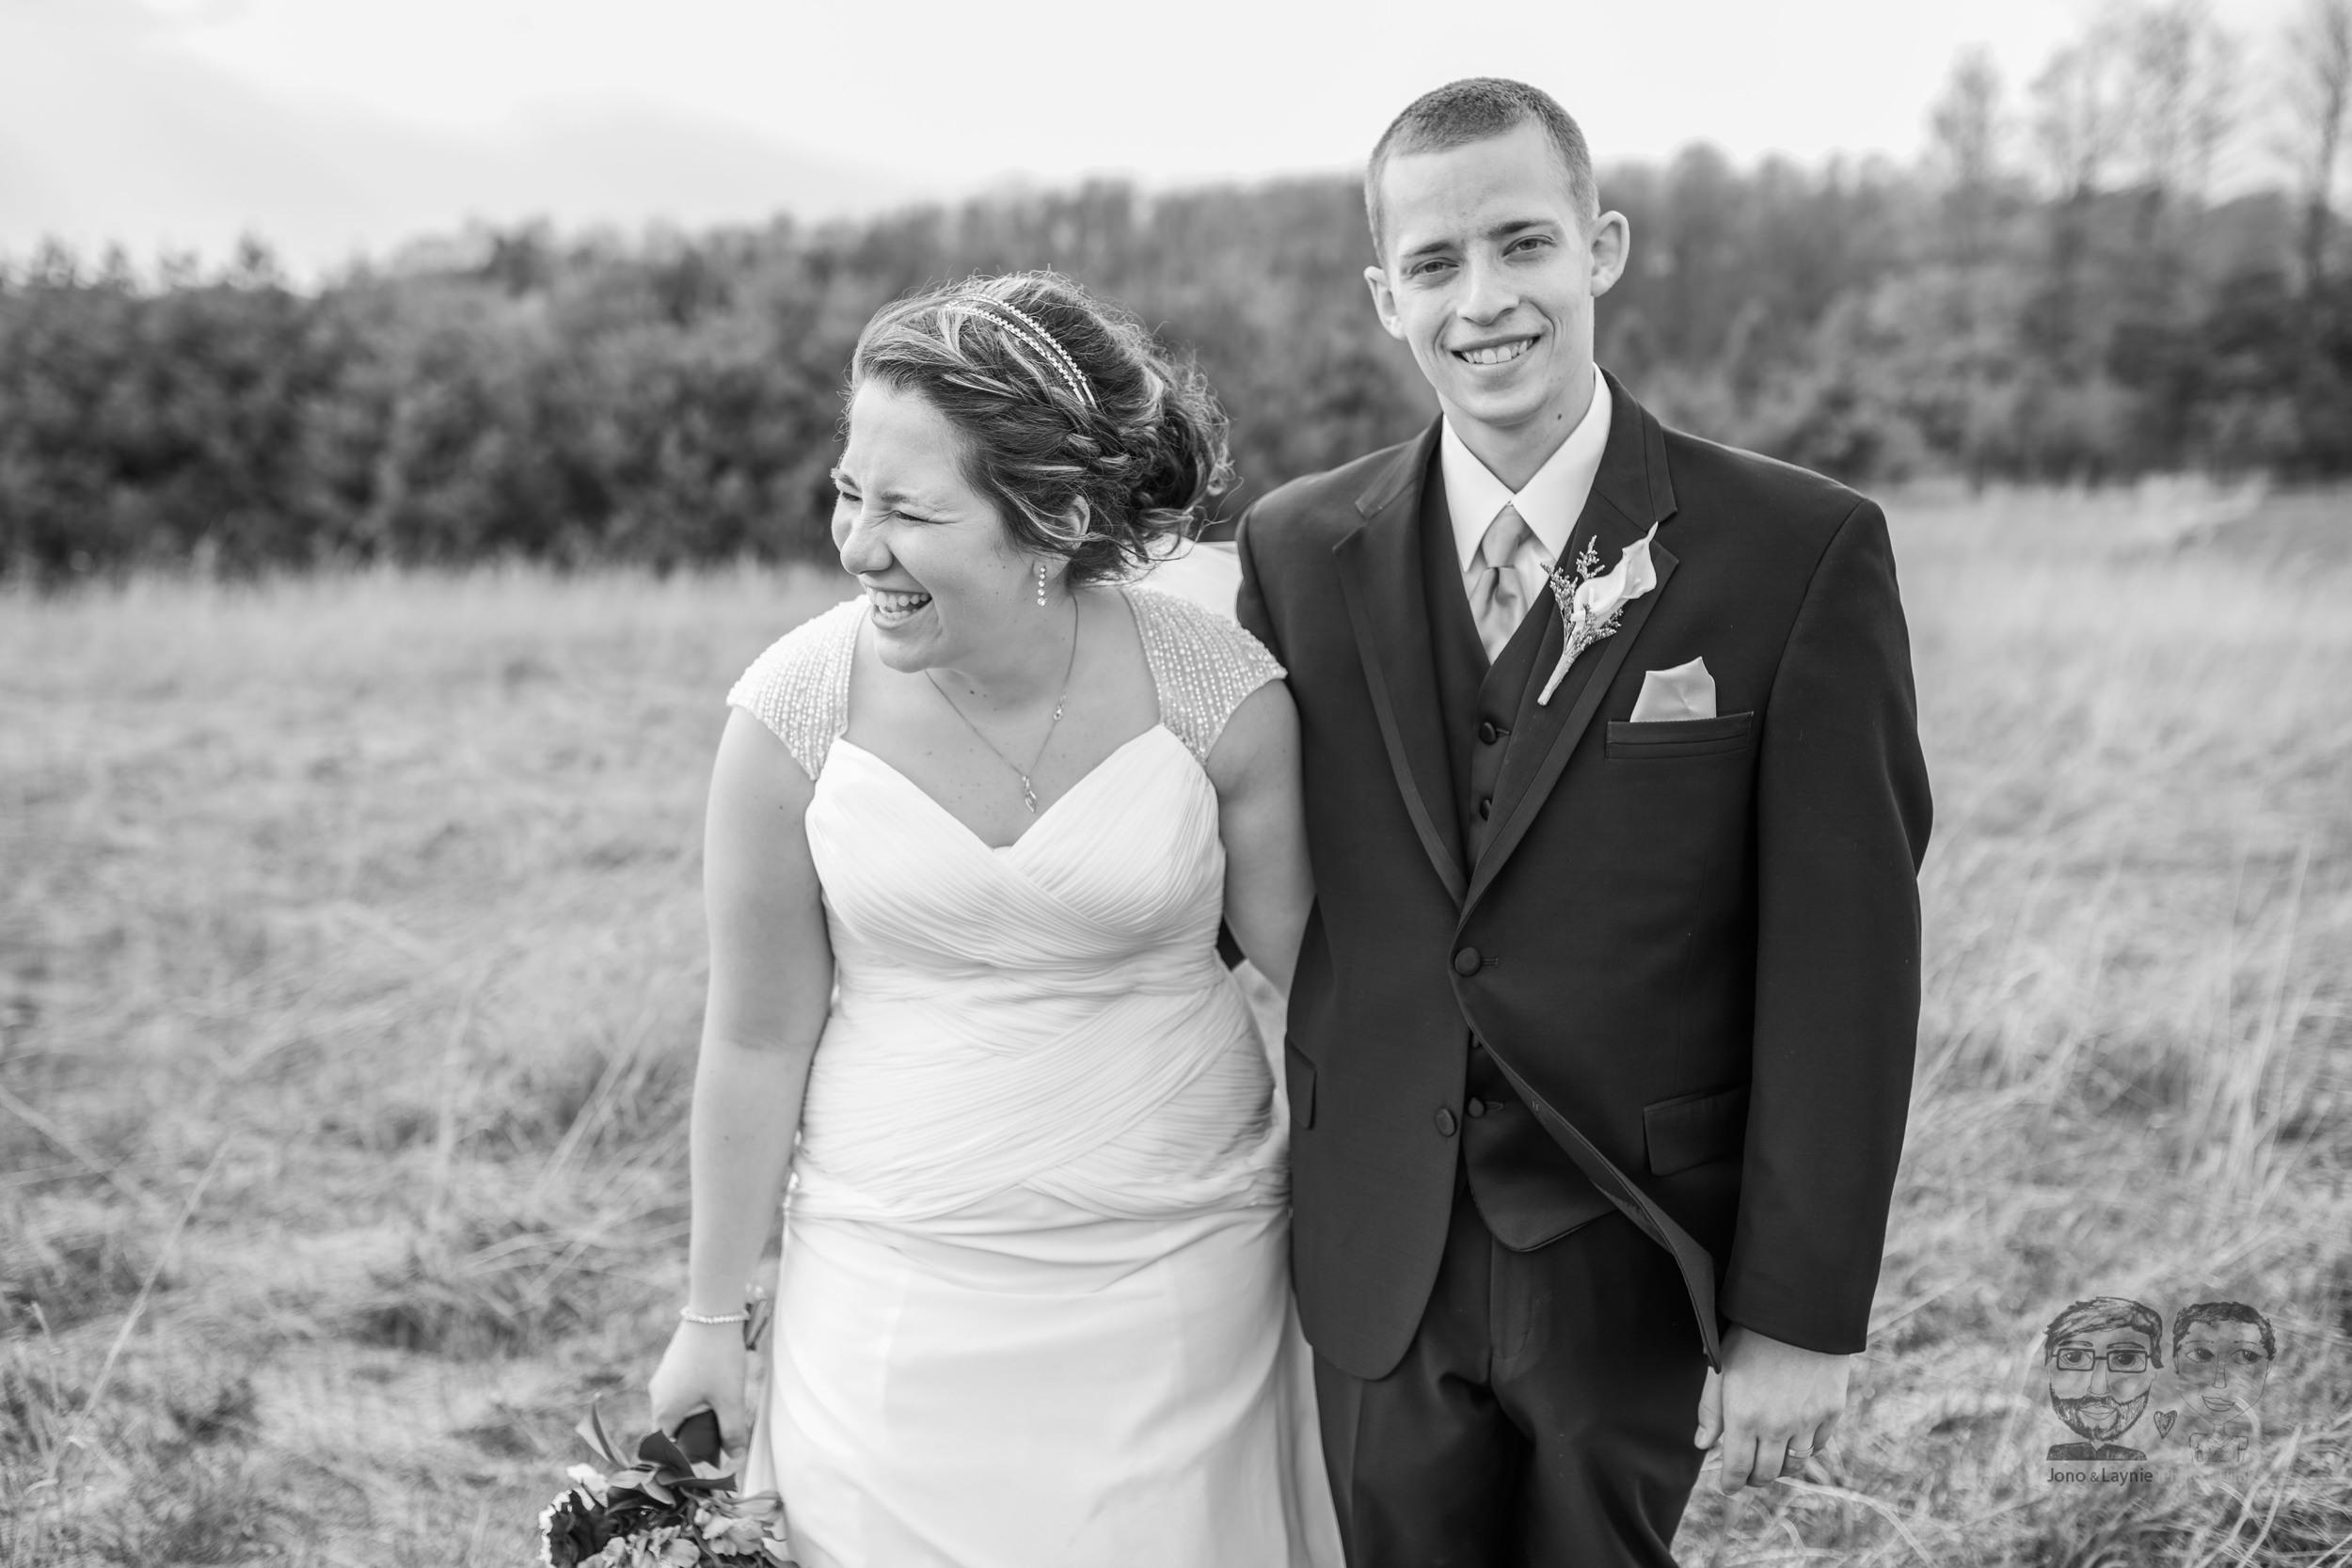 40Toronto Wedding Photographers and Videographers-Jono & Laynie Co.-Orangeville Wedding.jpg